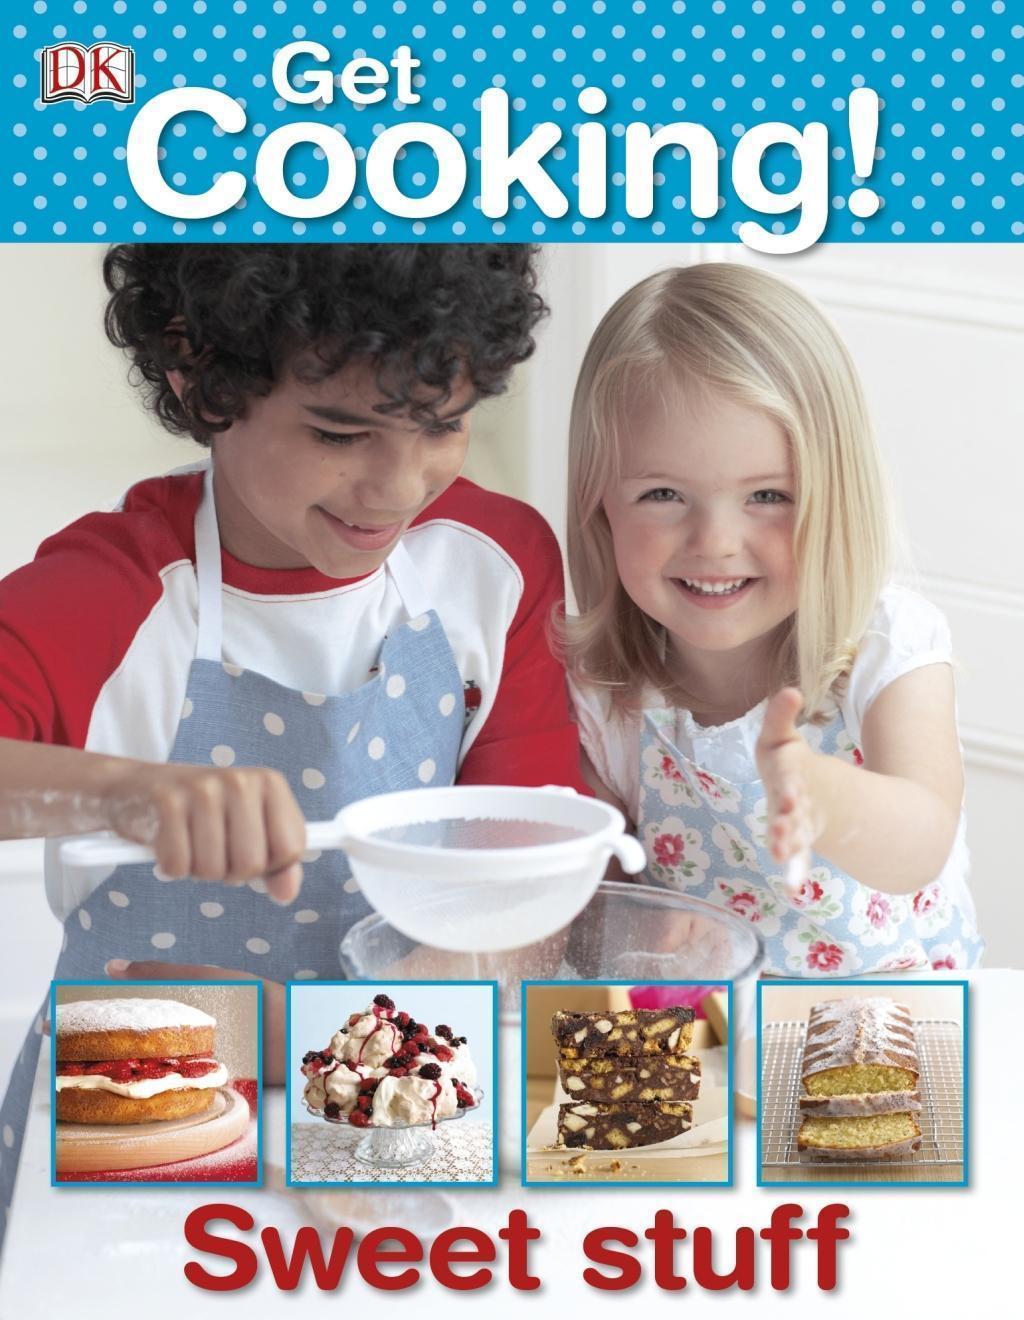 Get Cooking! Sweet Stuff